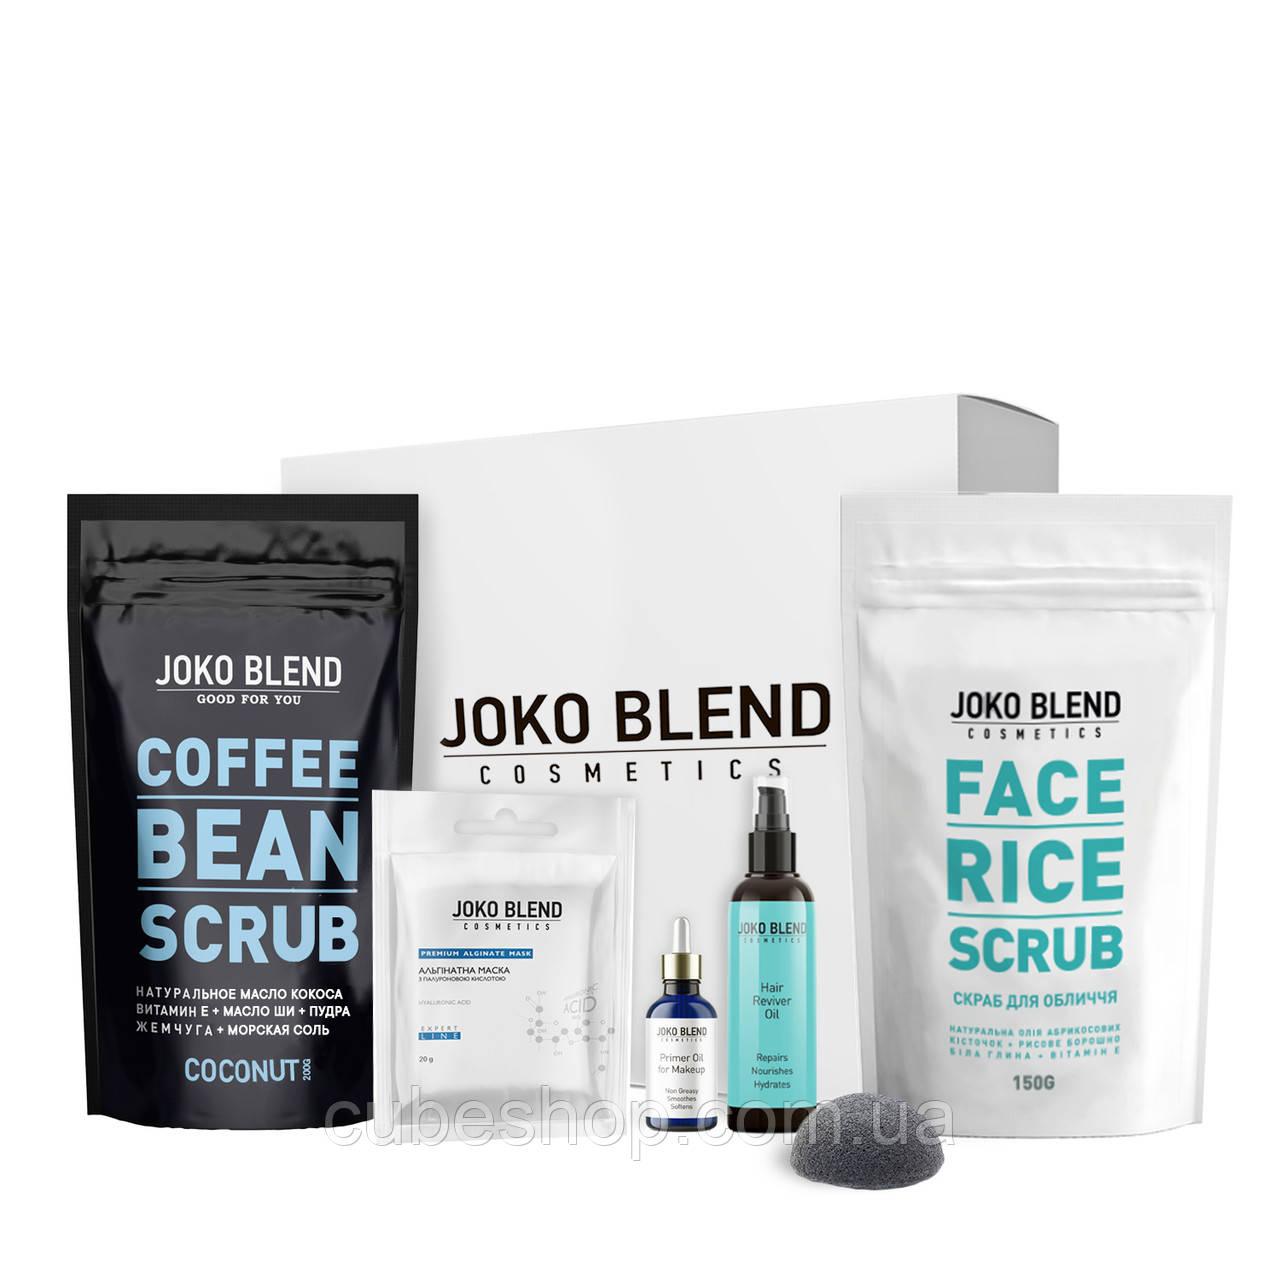 Подарочный набор Beauty gift pack Joko Blend